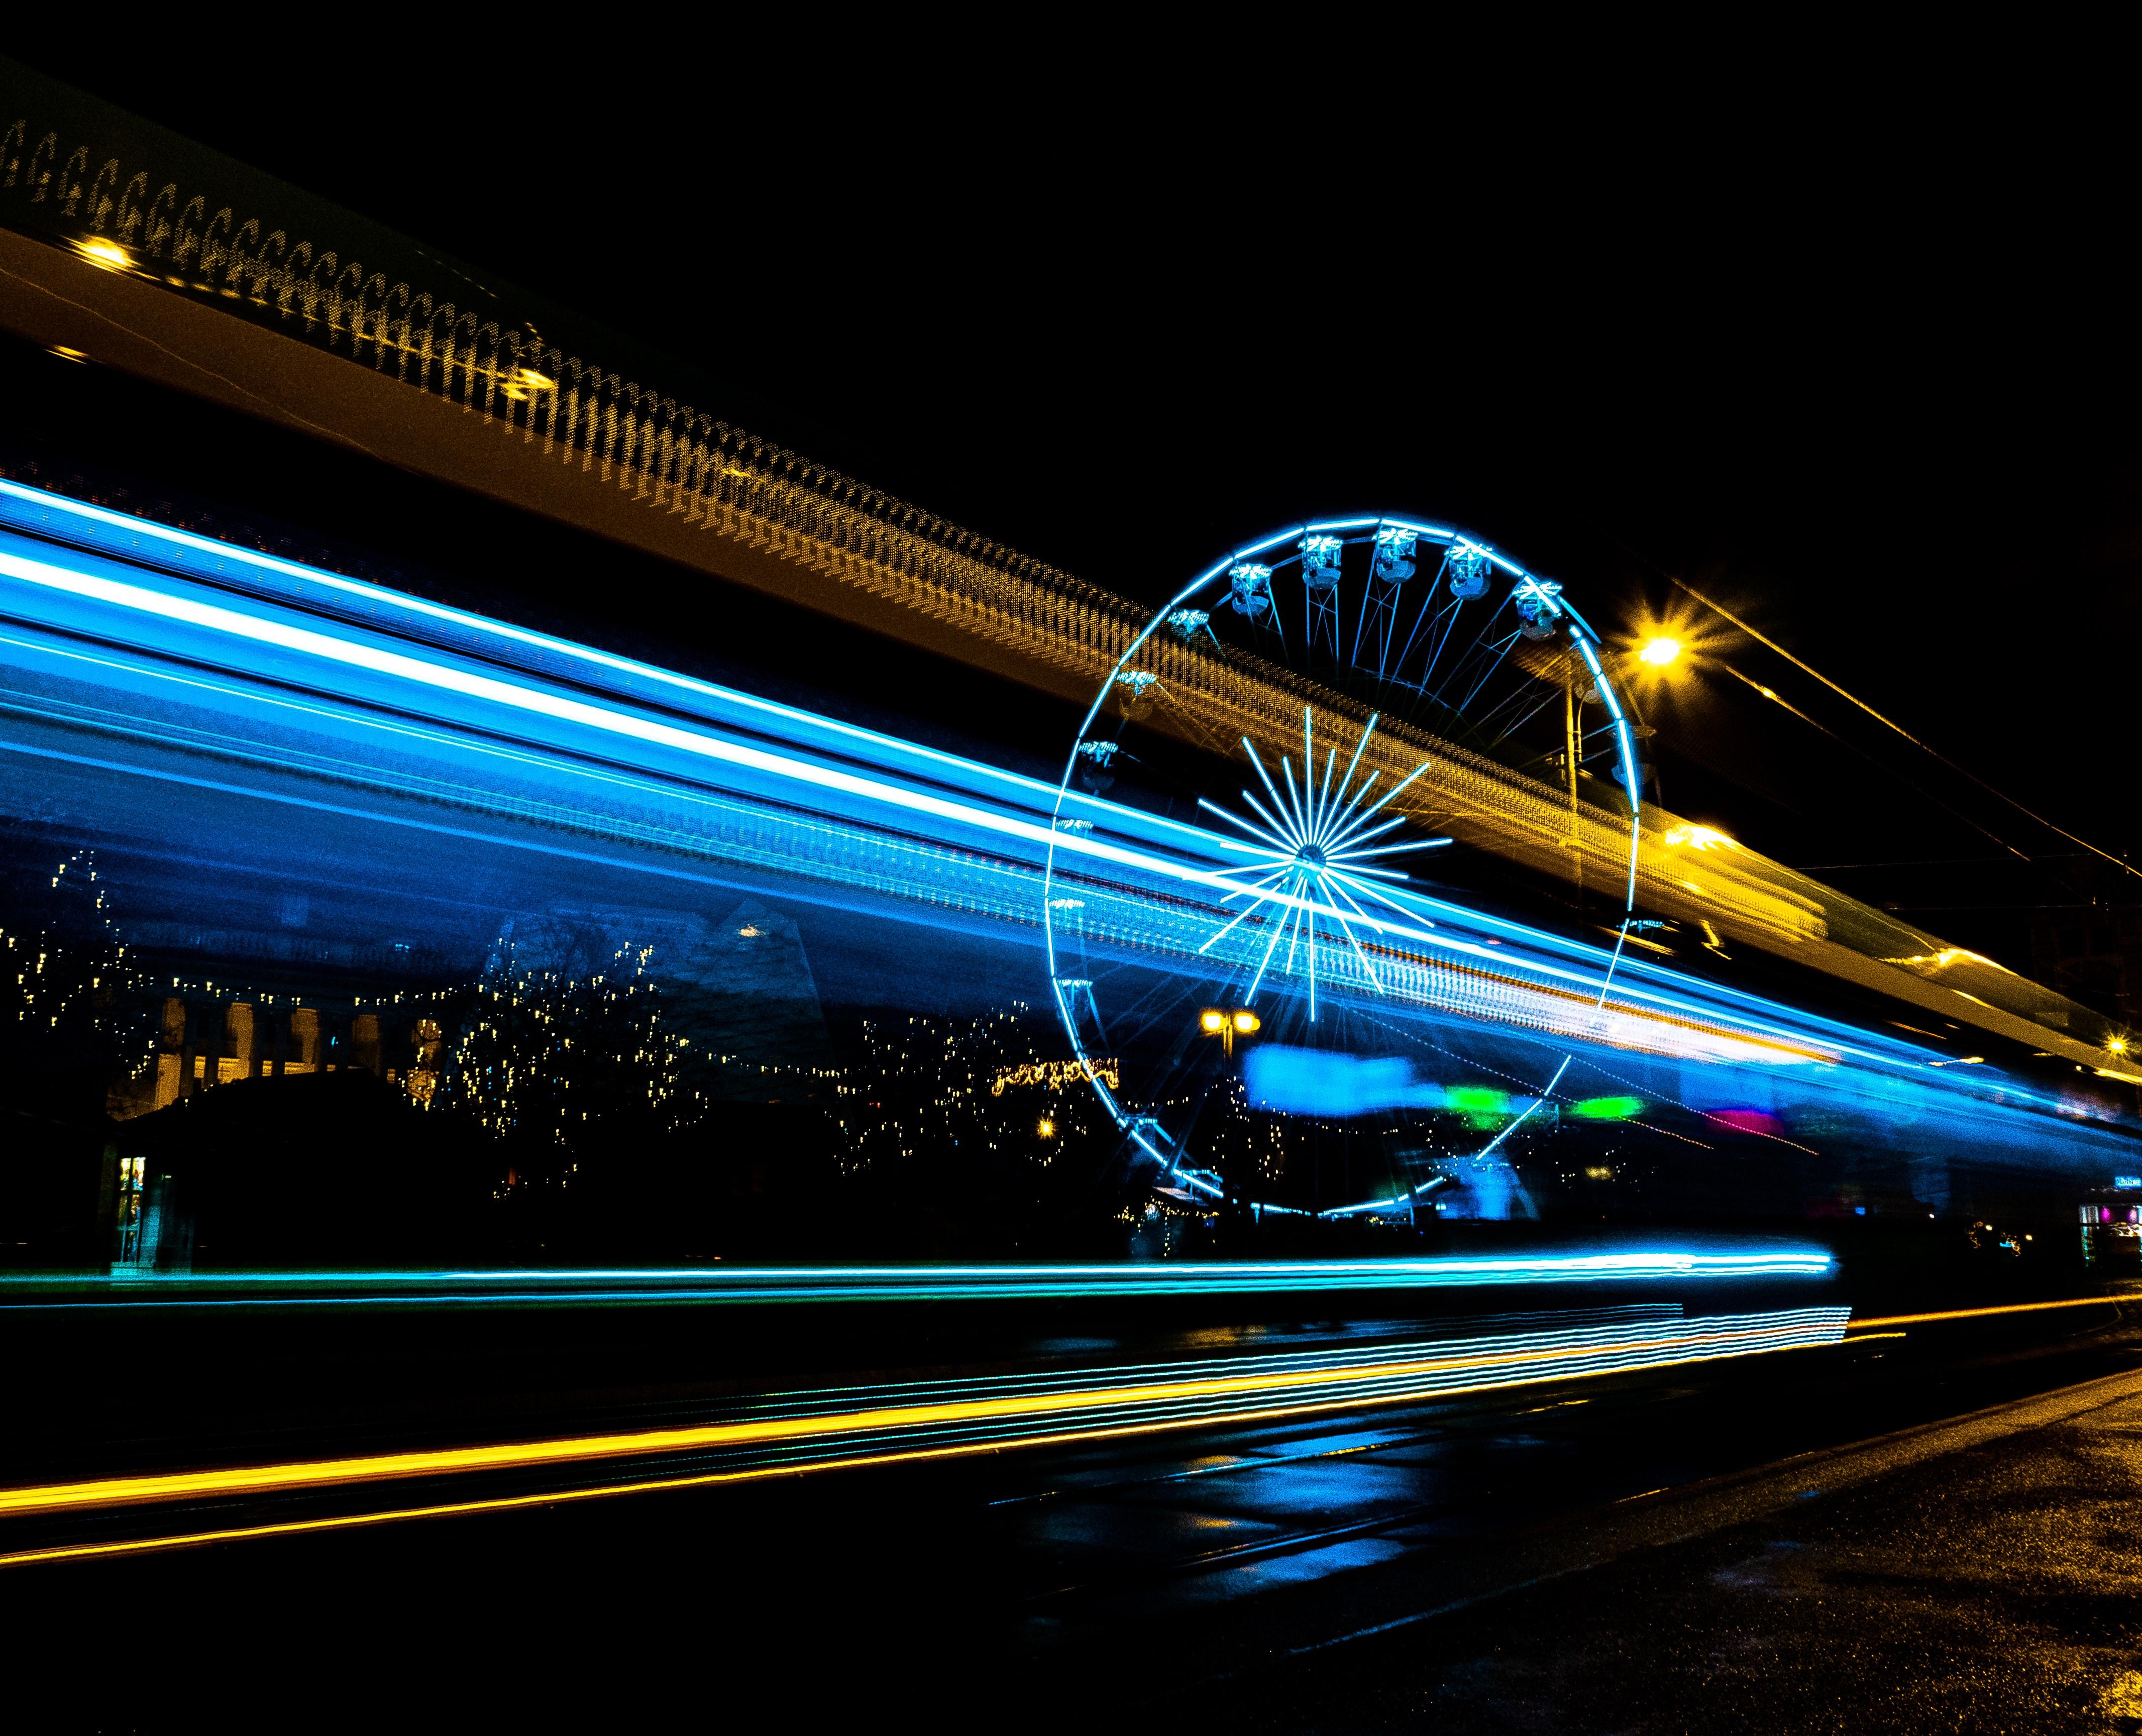 bright lights speeding through a dark sky, c. Radek Kilijanek, Unsplash